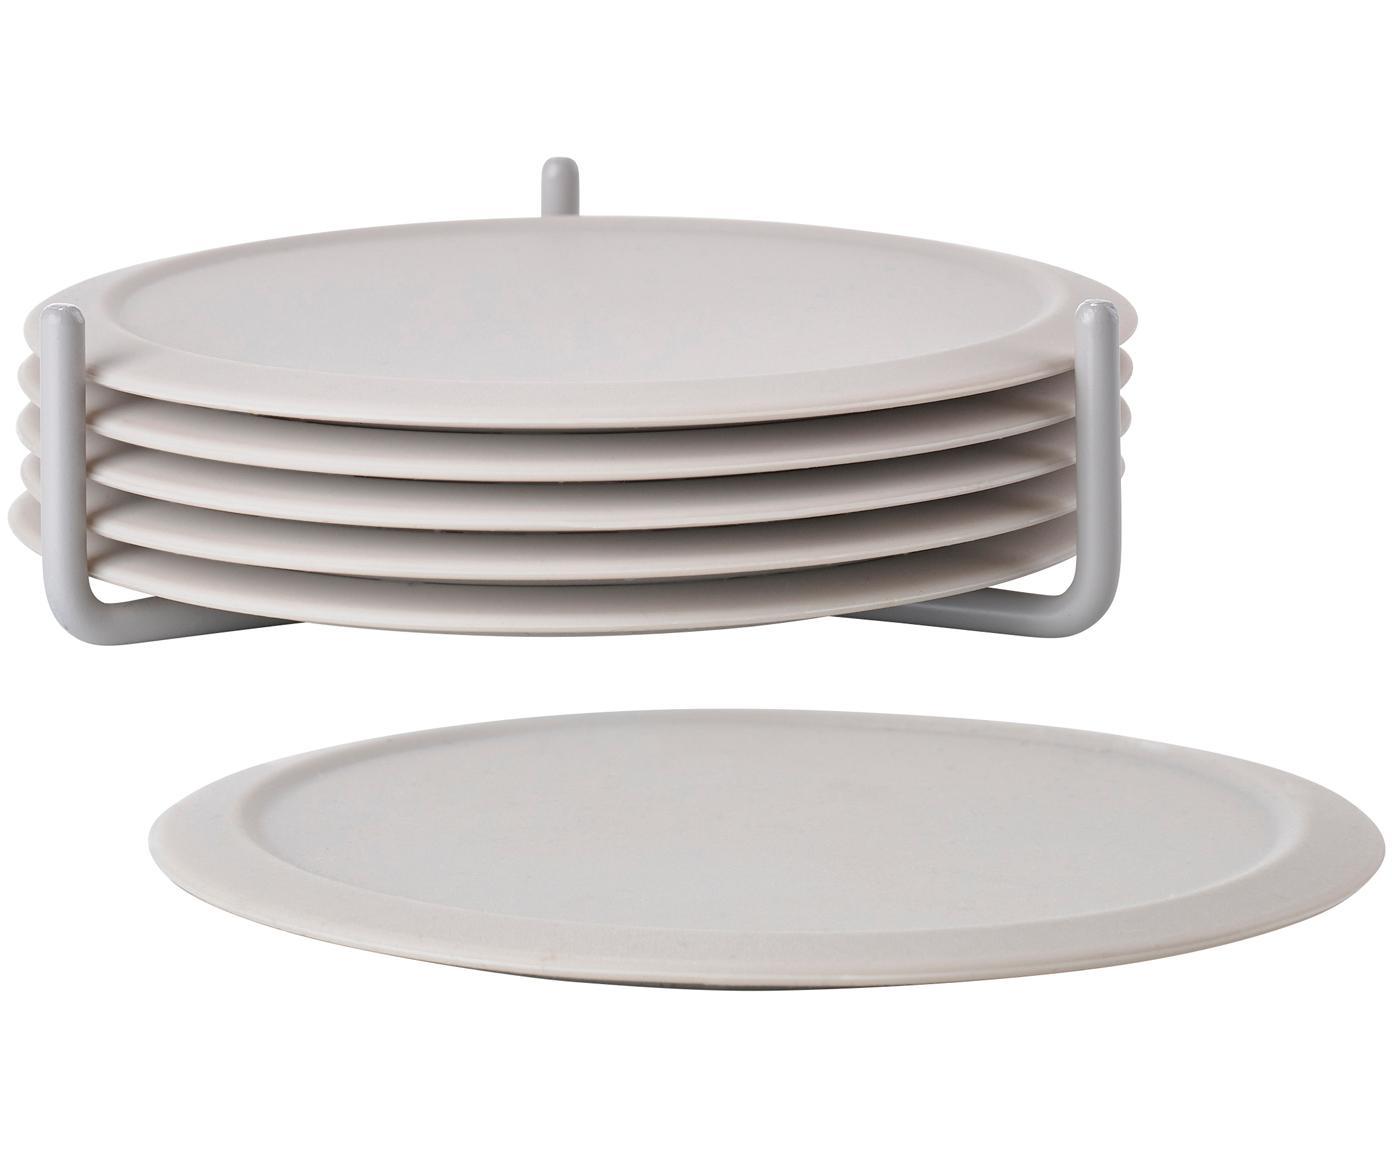 Set de posavasos Plain, 7pzas., Blanco crudo, Ø 10 cm